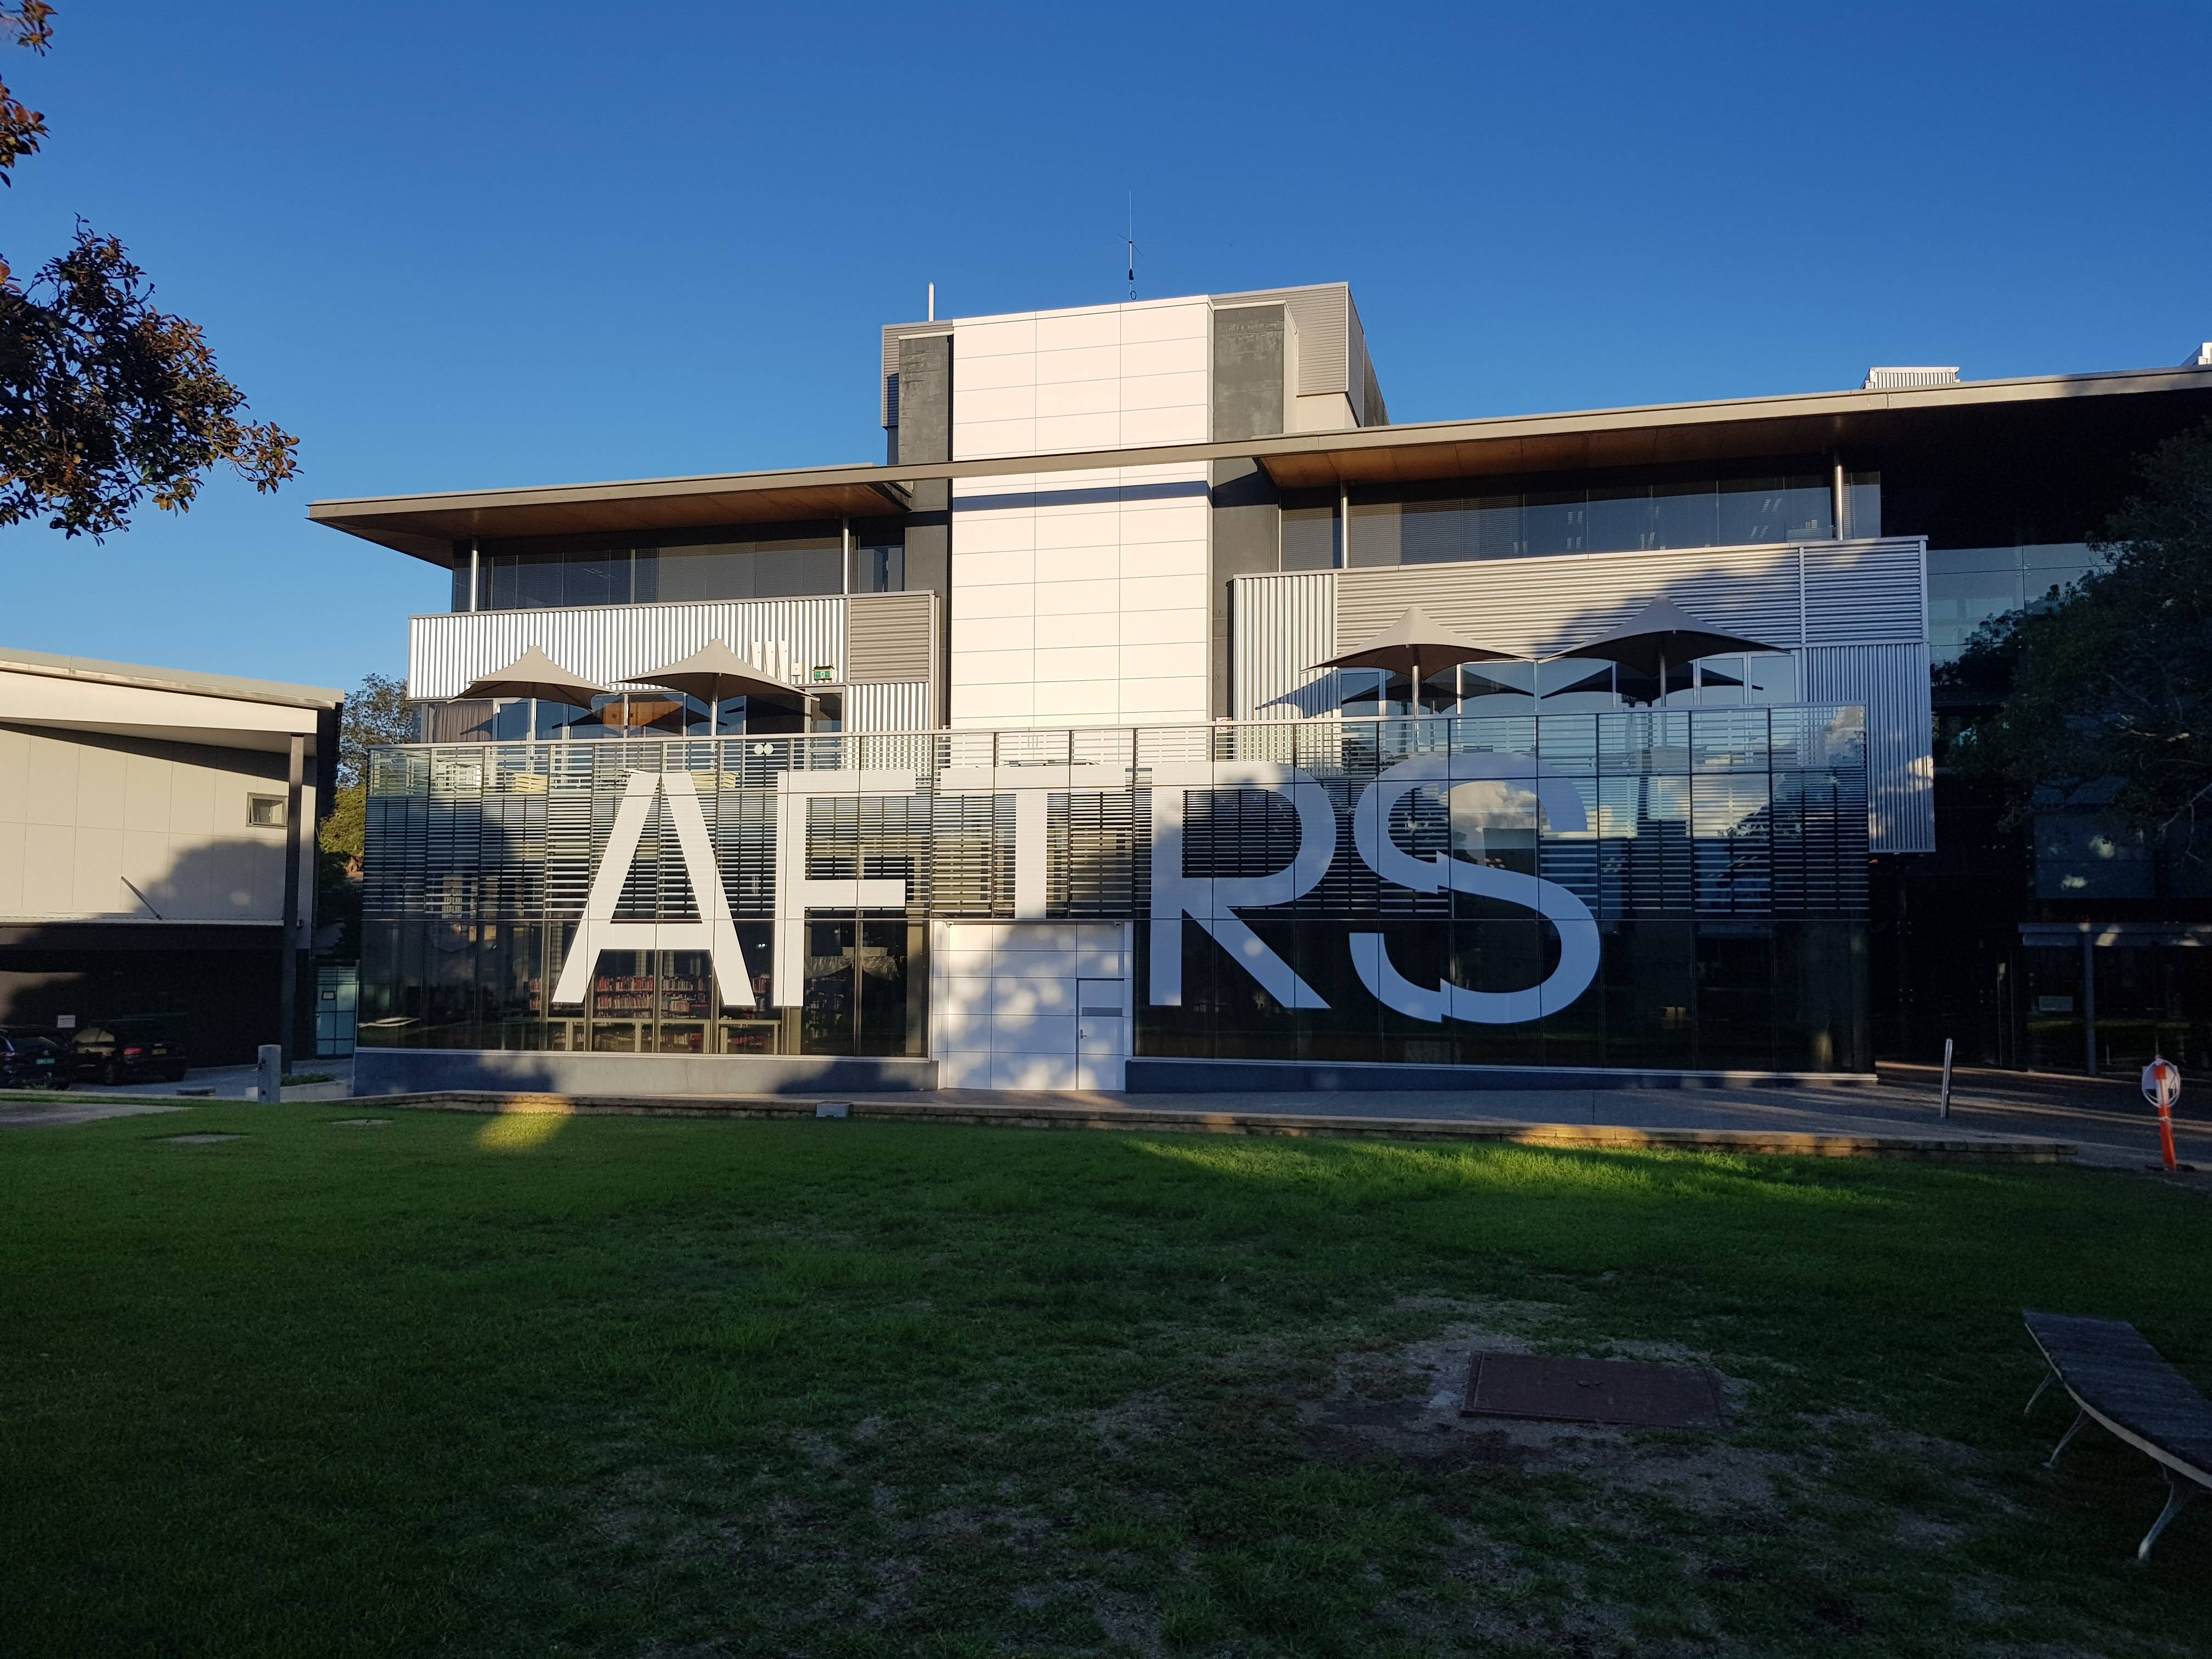 online film courses australia